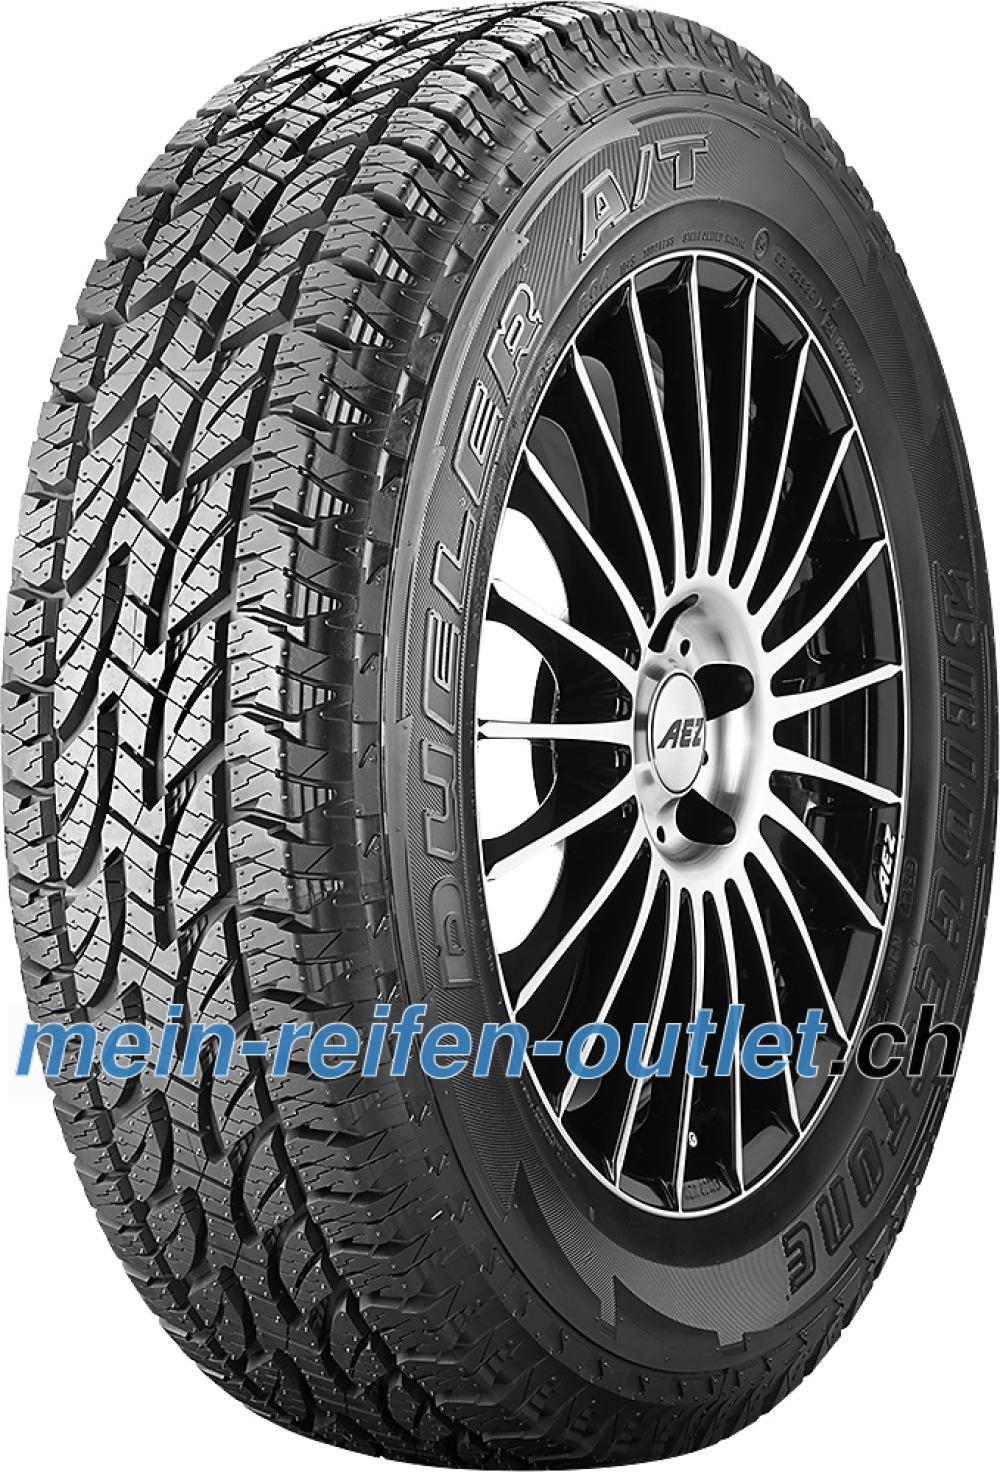 Bridgestone Dueler A/T 694 ( 215/70 R16 100S , mit Felgenschutz (MFS) RBL )